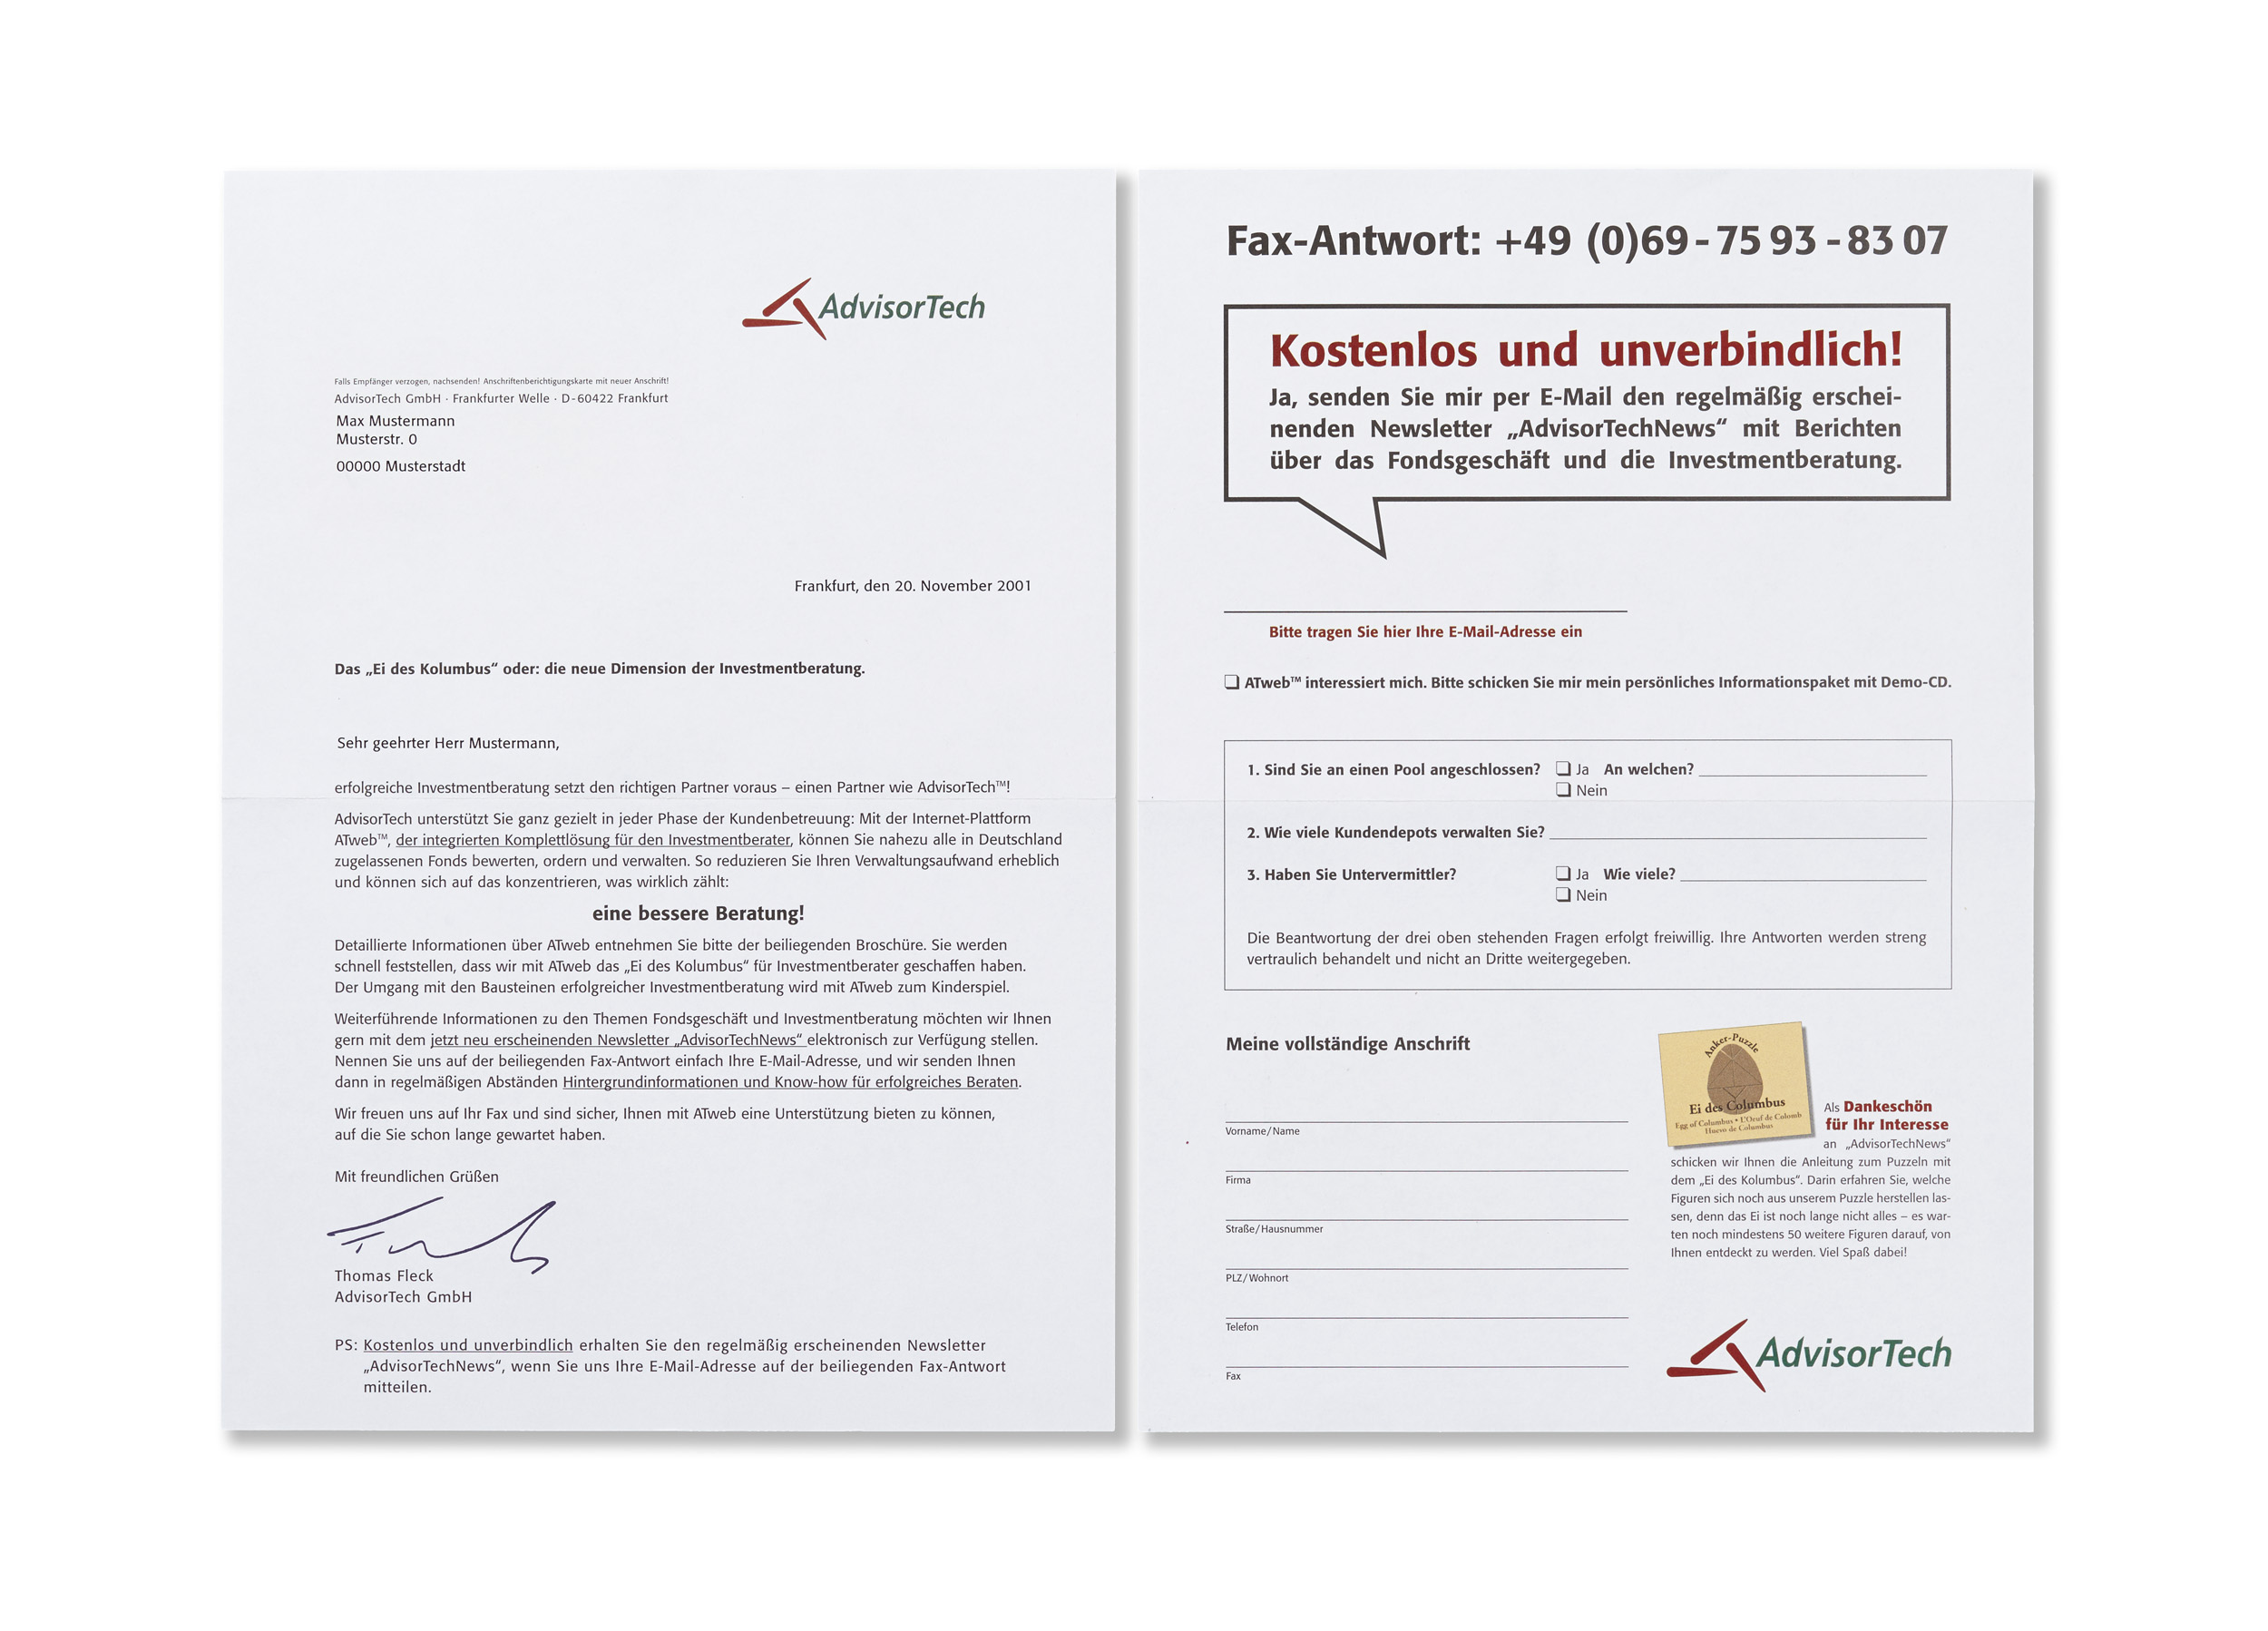 BlackertText AdvisorTech 06